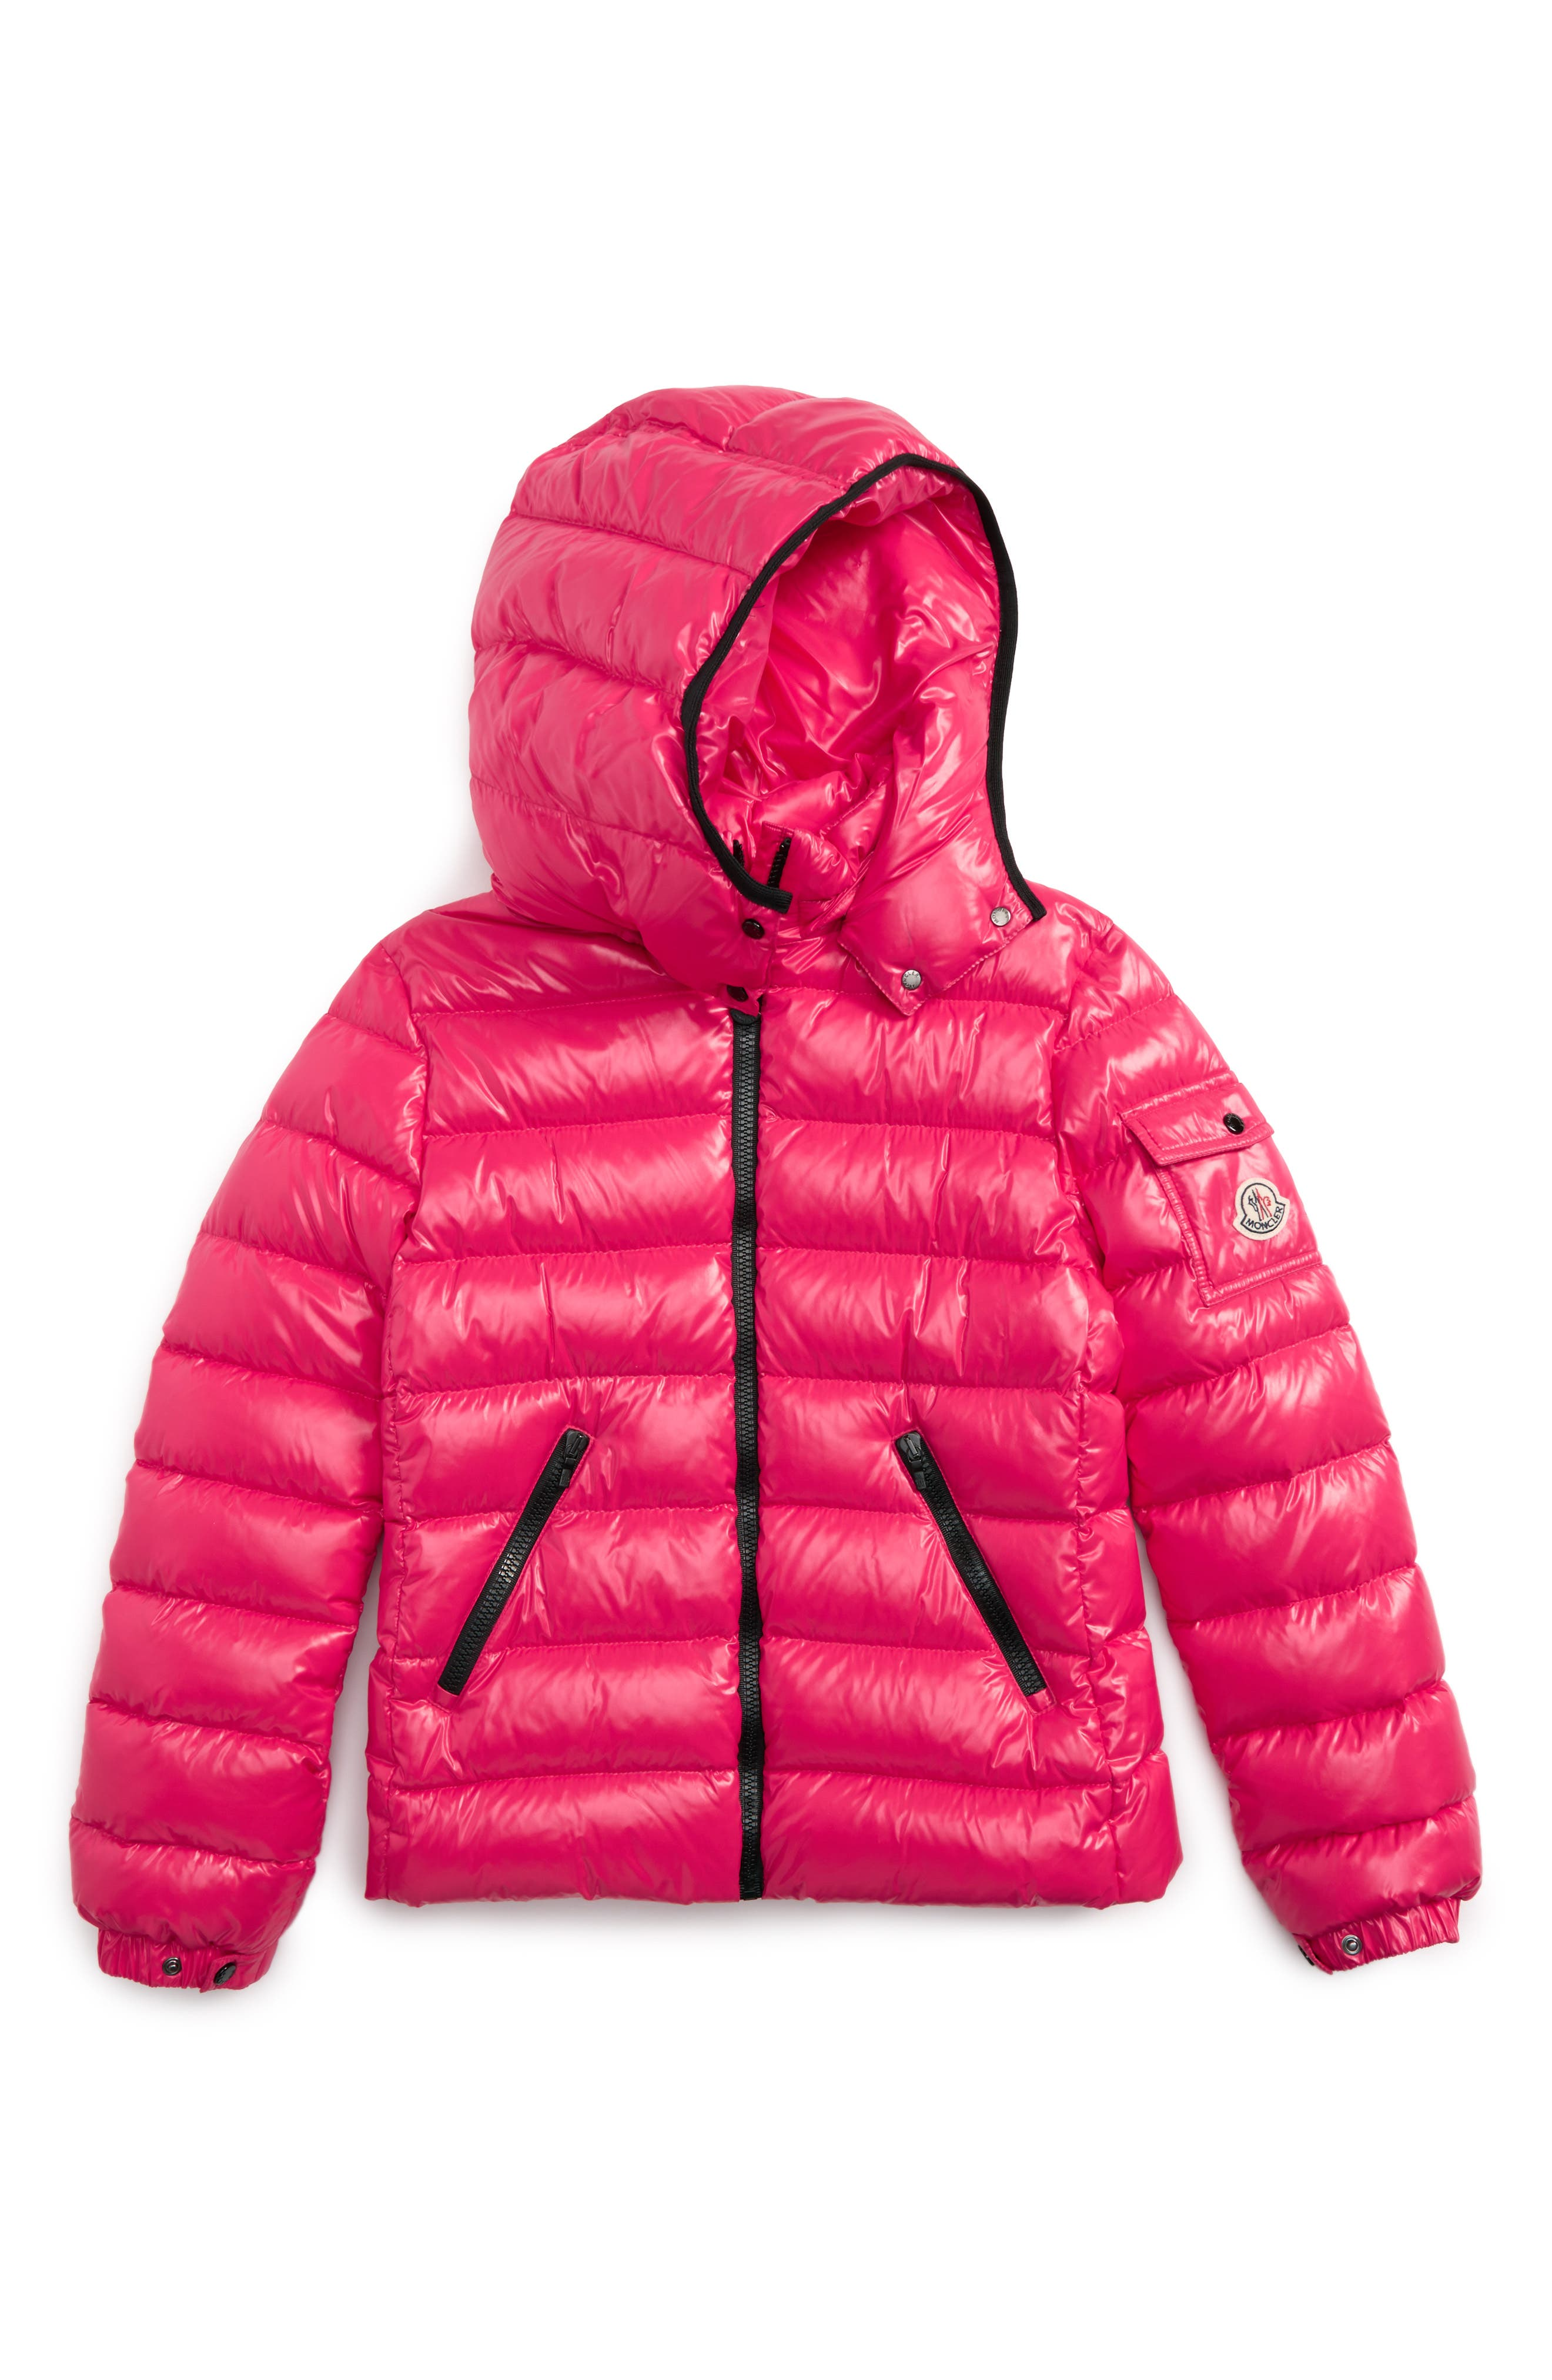 Bady Hooded Down Jacket,                         Main,                         color, FUCHSIA